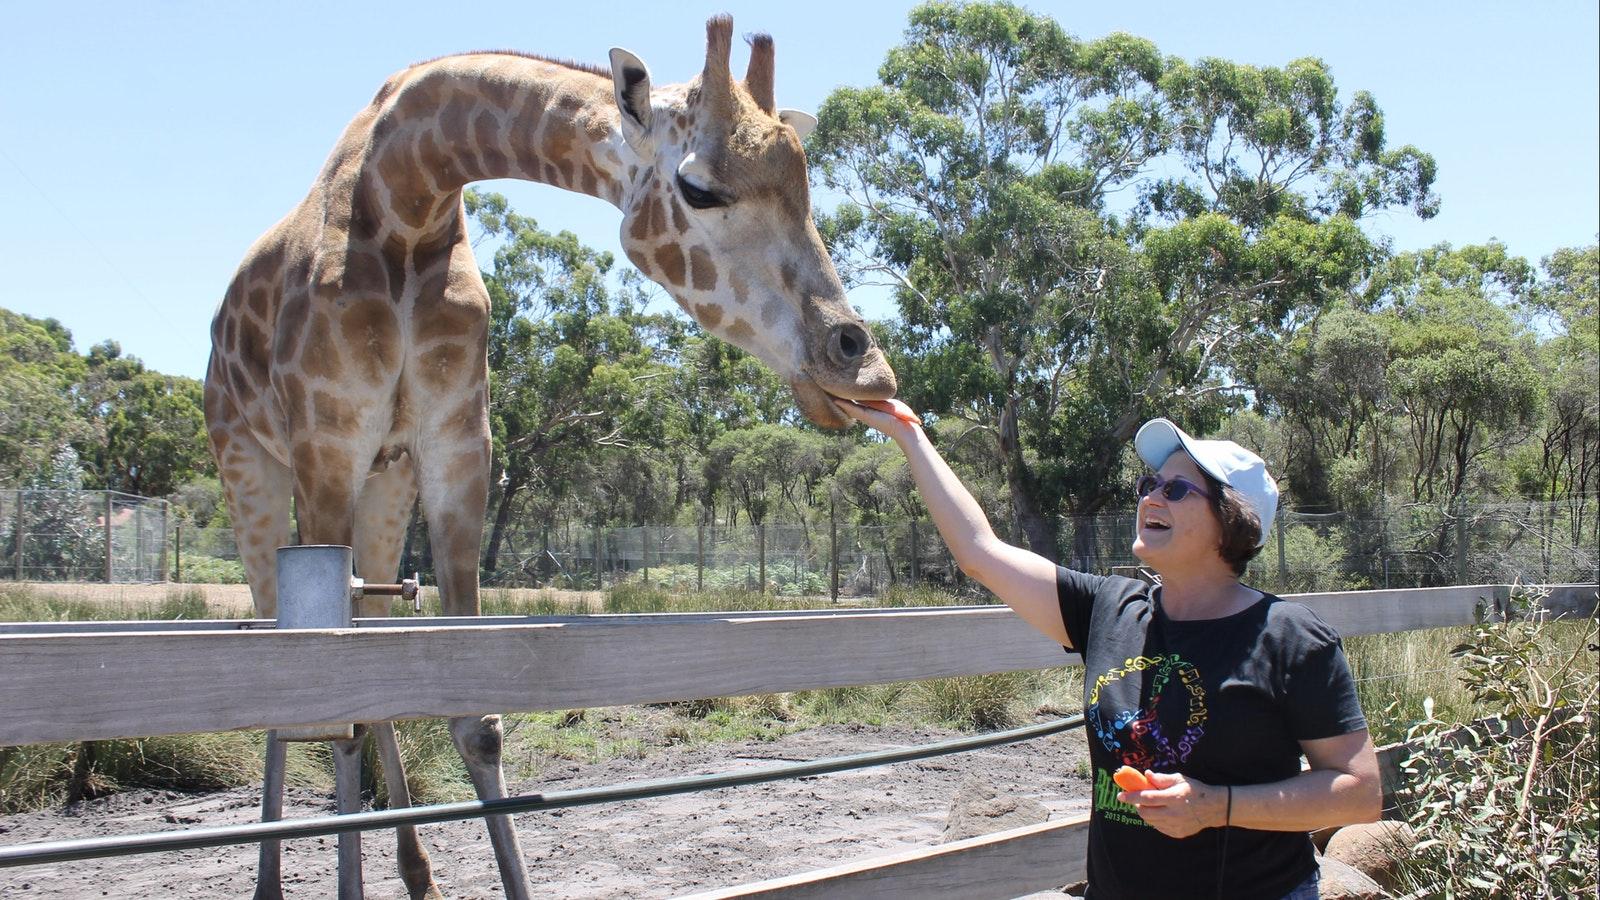 Meet the Giraffe at Halls Gap Zoo